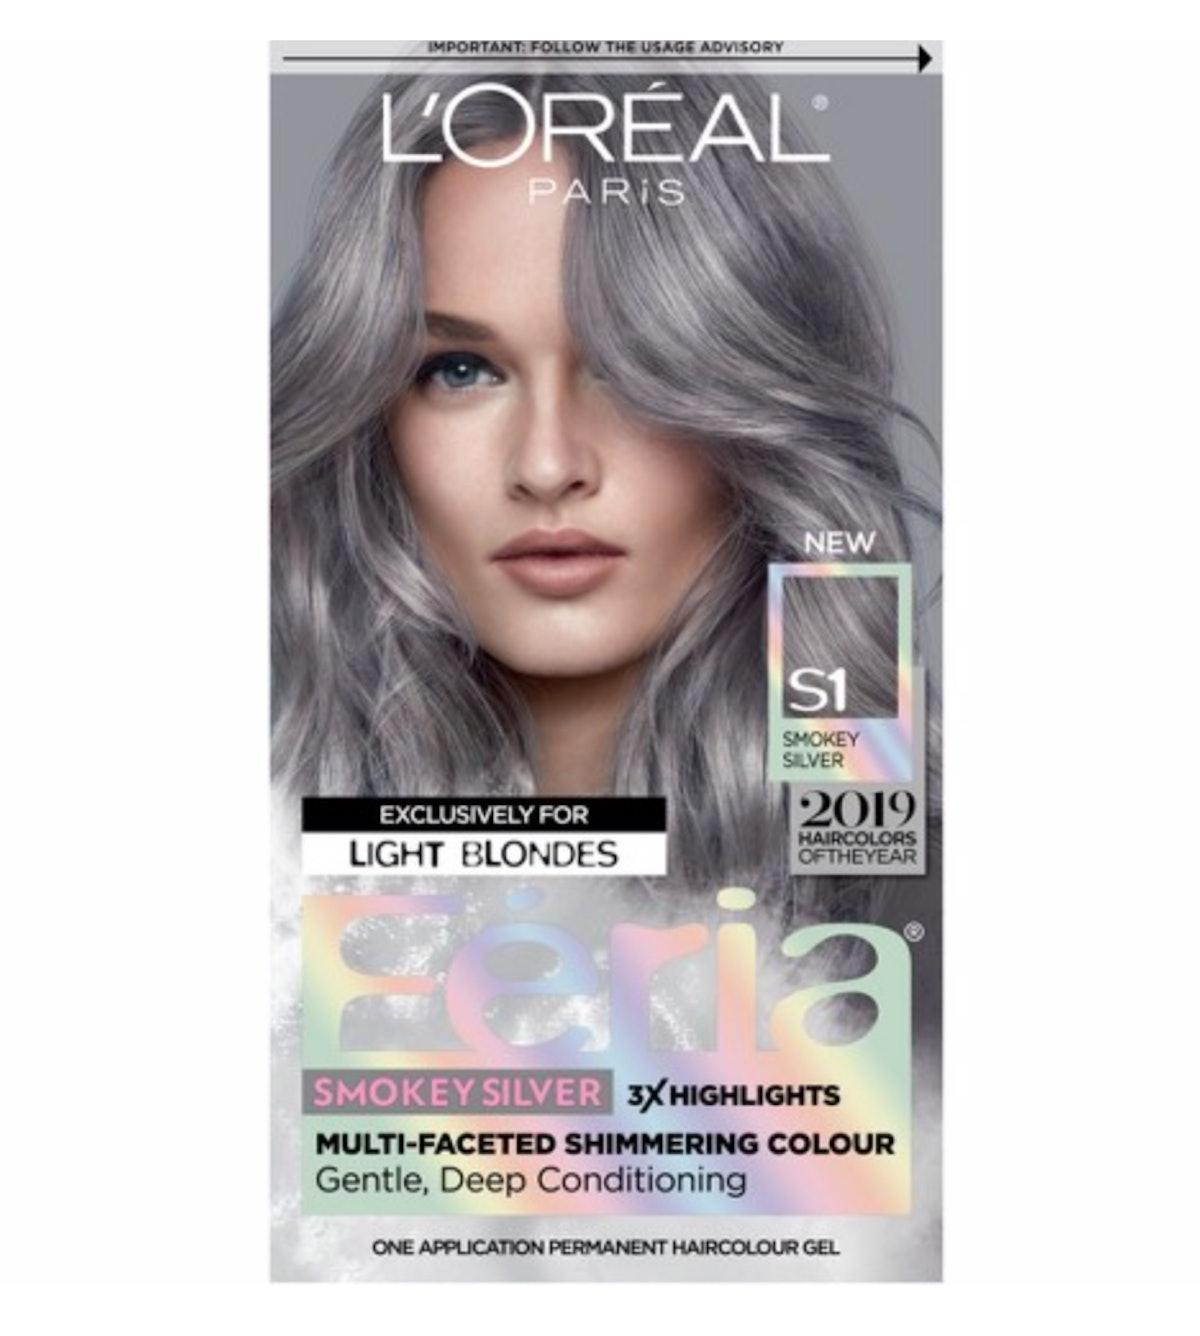 L'Oreal Paris Feria Permanent Hair Color in Smokey Silver